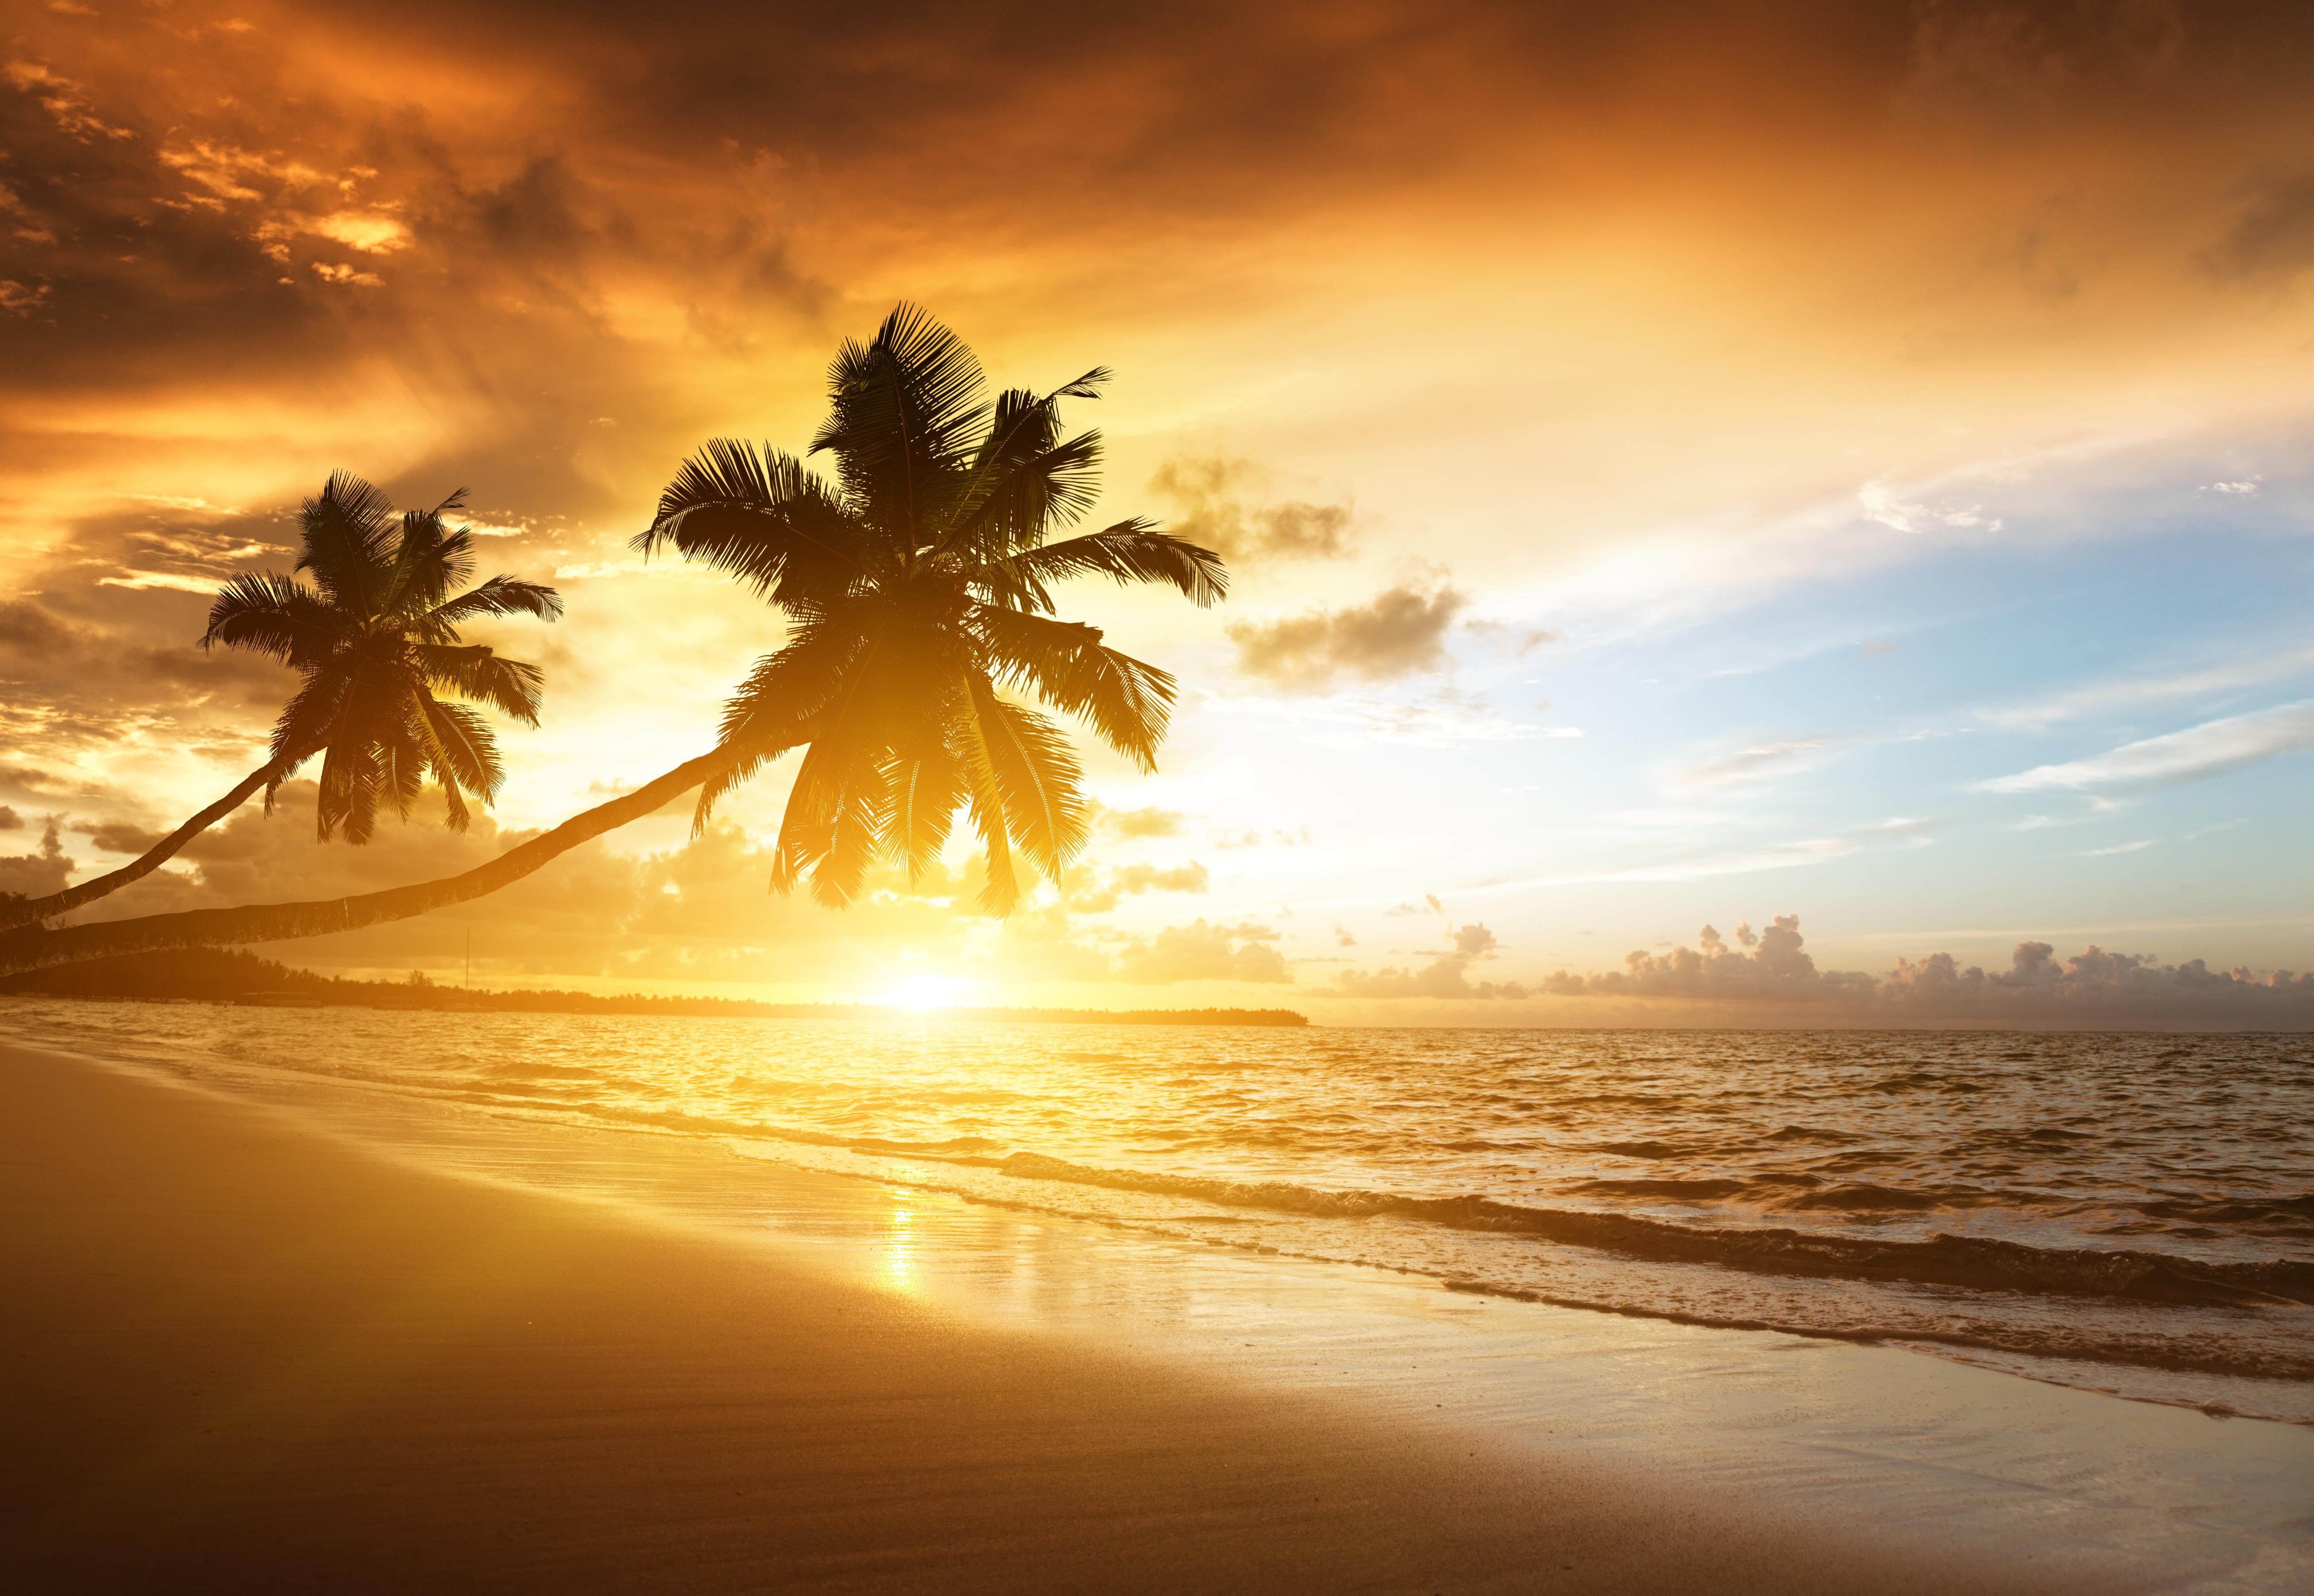 Sunrise 5k Retina Ultra Hd Wallpaper Background Image